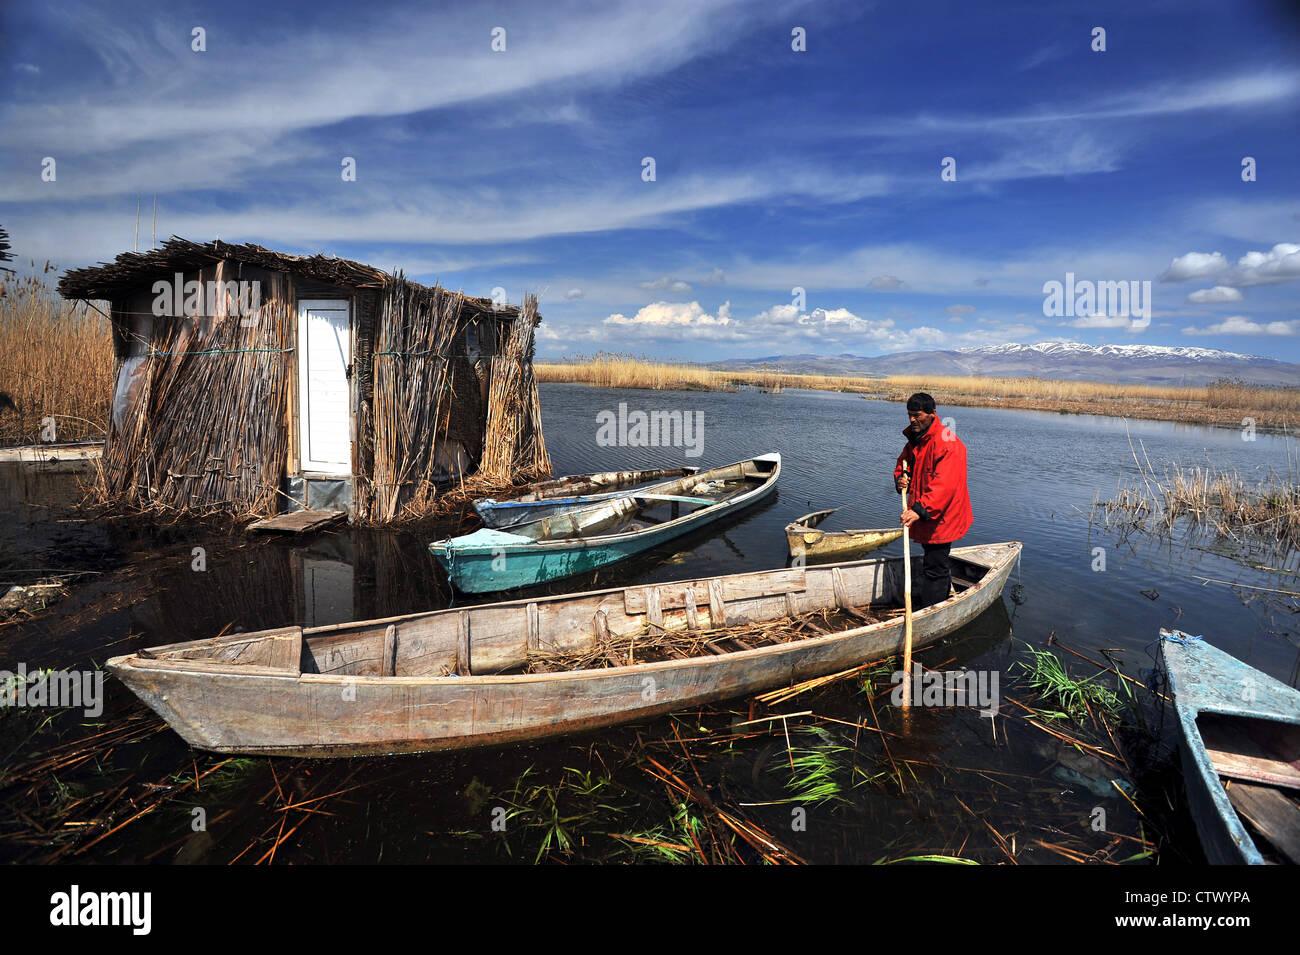 Scenic view of Eber Lake Afyon Turkey - Stock Image